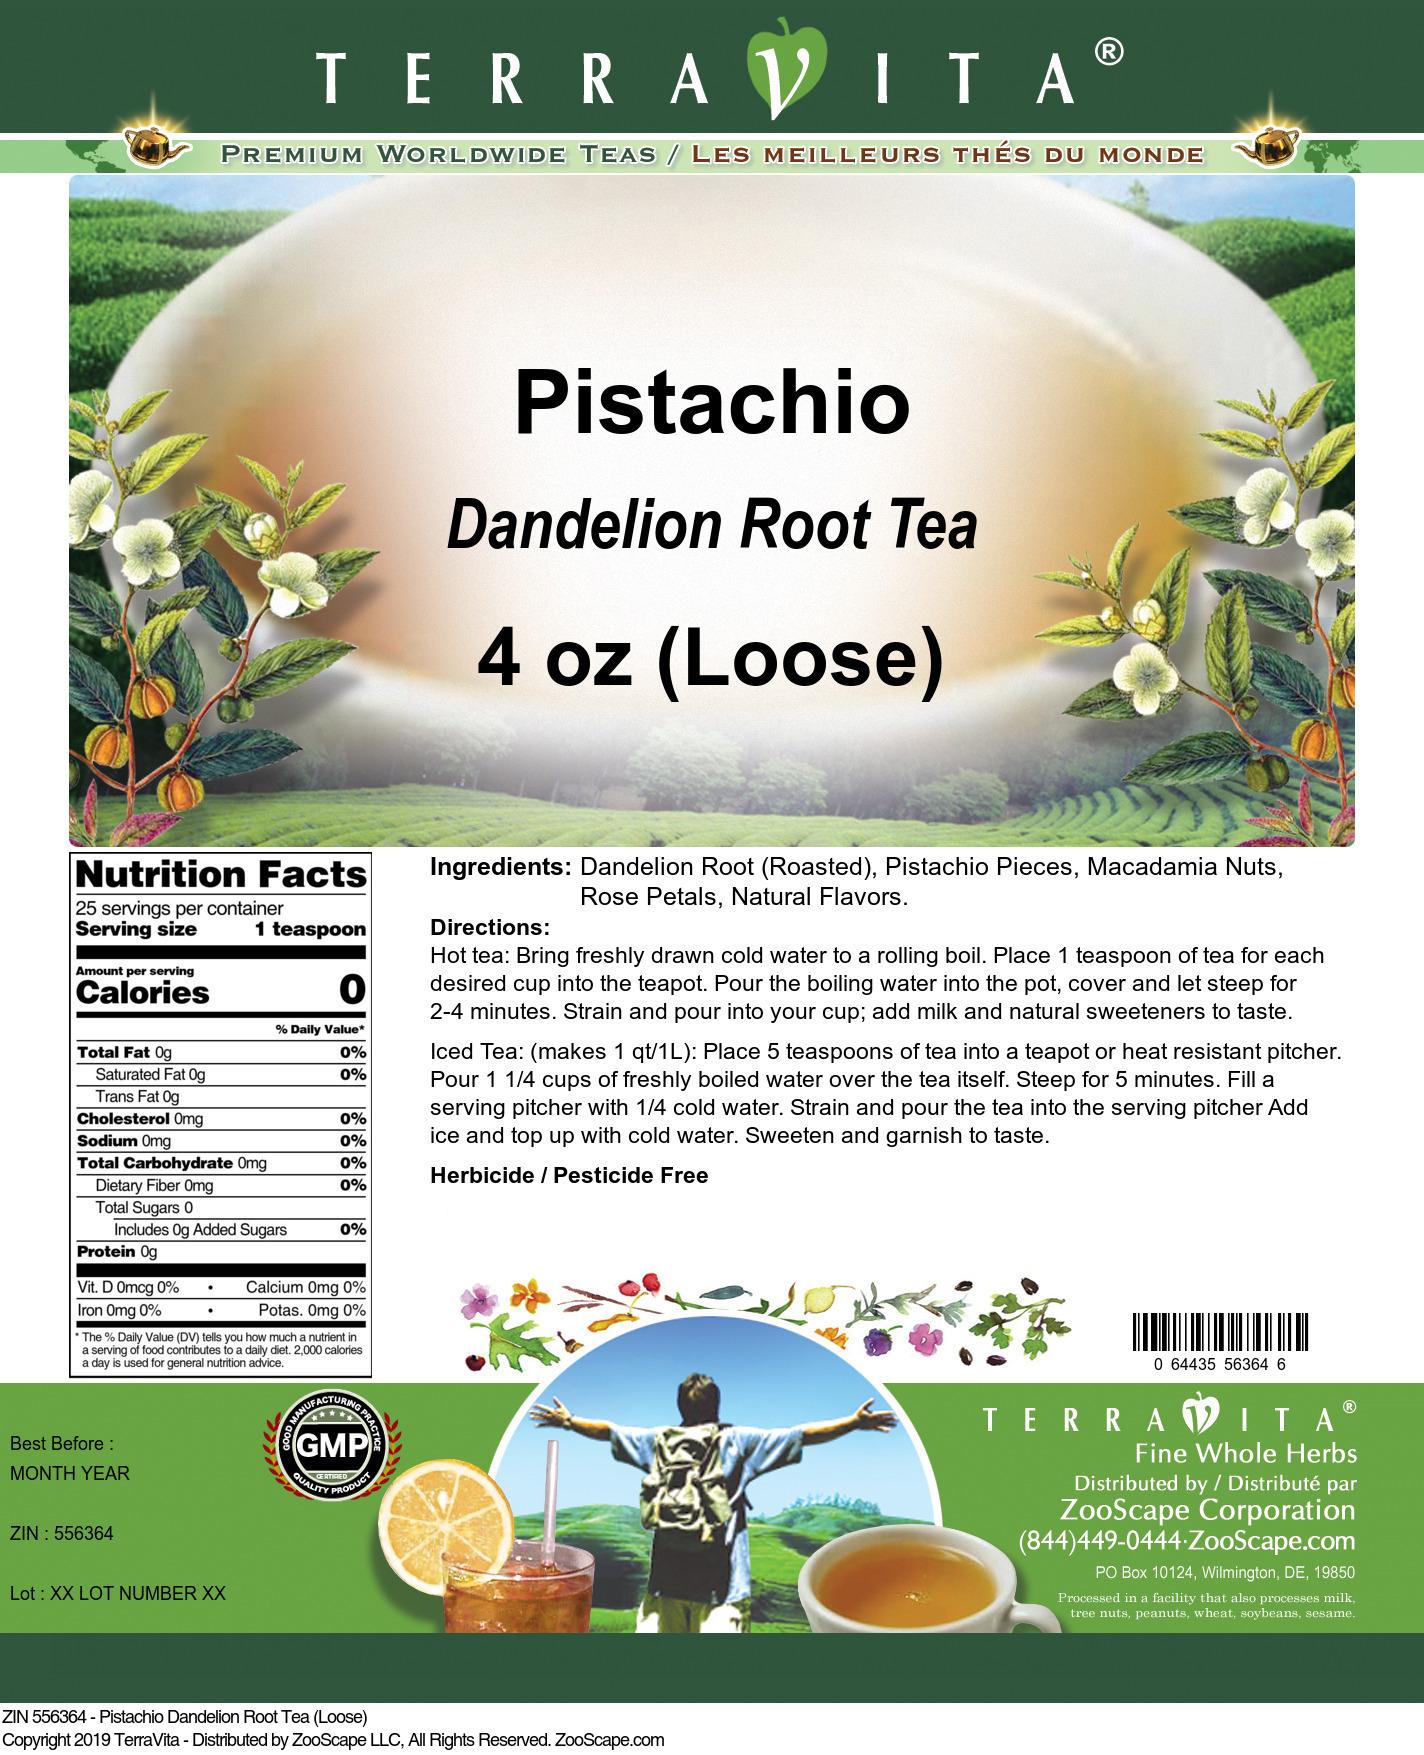 Pistachio Dandelion Root